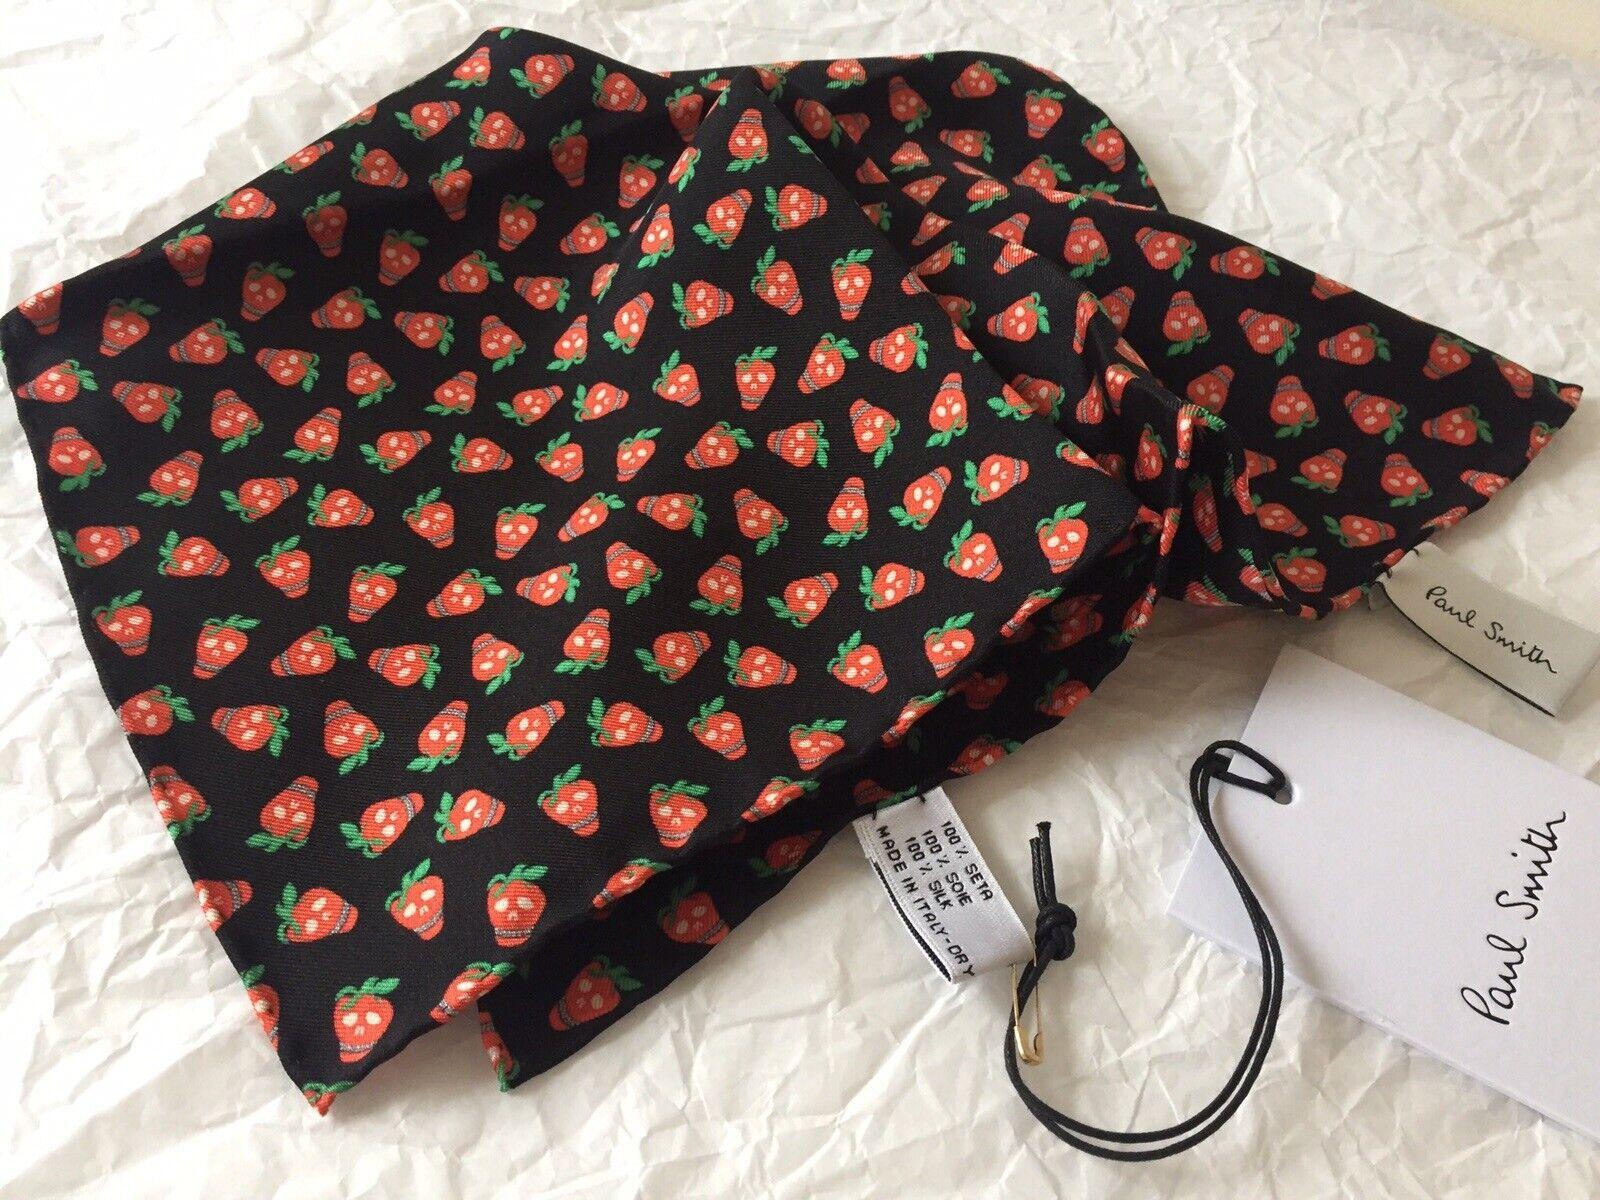 BNWT - Paul Smith Pocket Square Handkerchief 100% Silk Strawberry Skull RRP